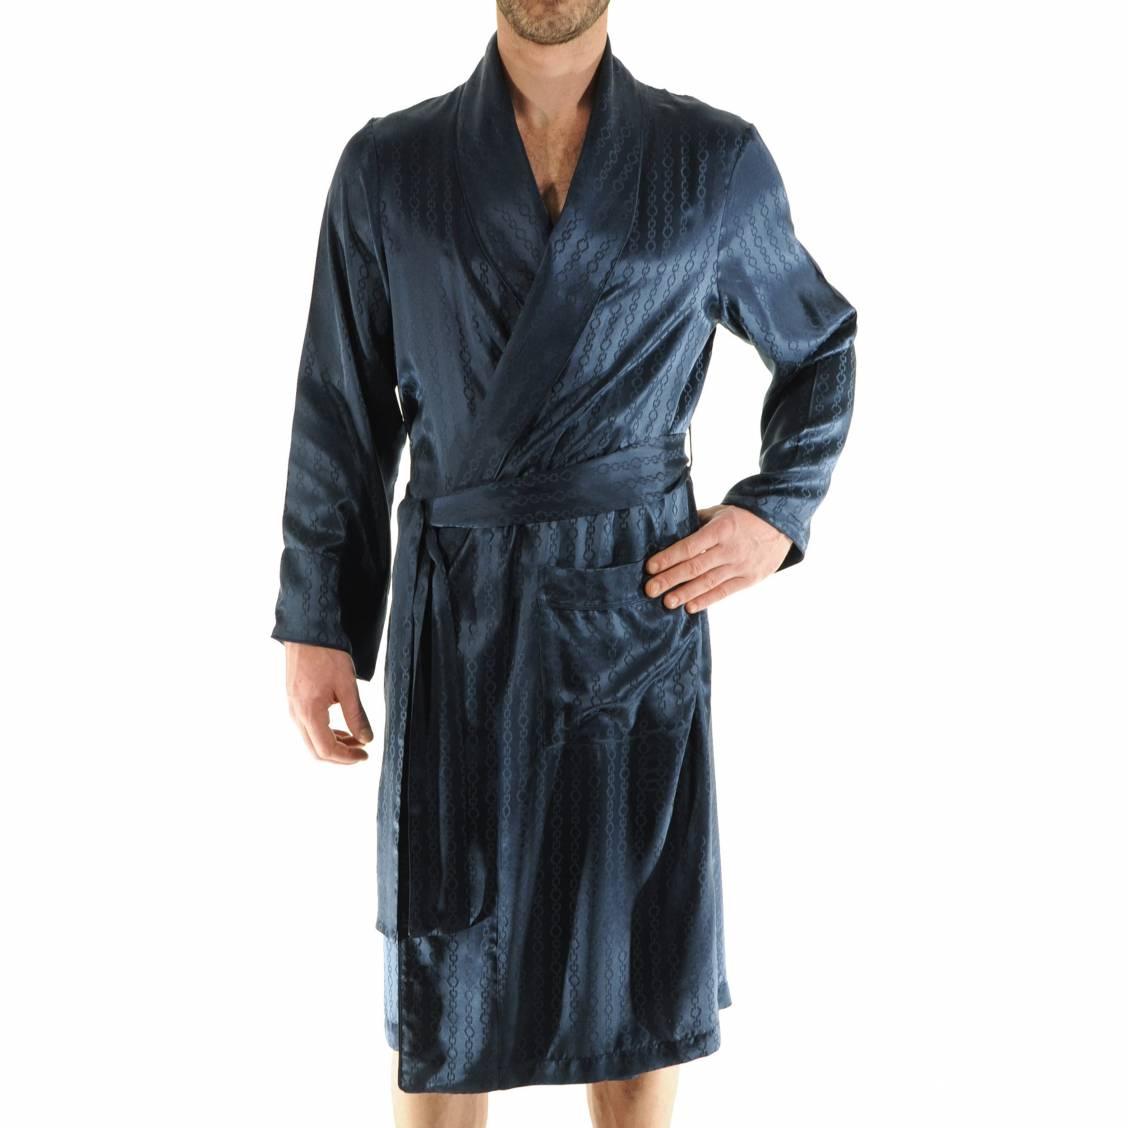 Robe de chambre en soie bleu nuit